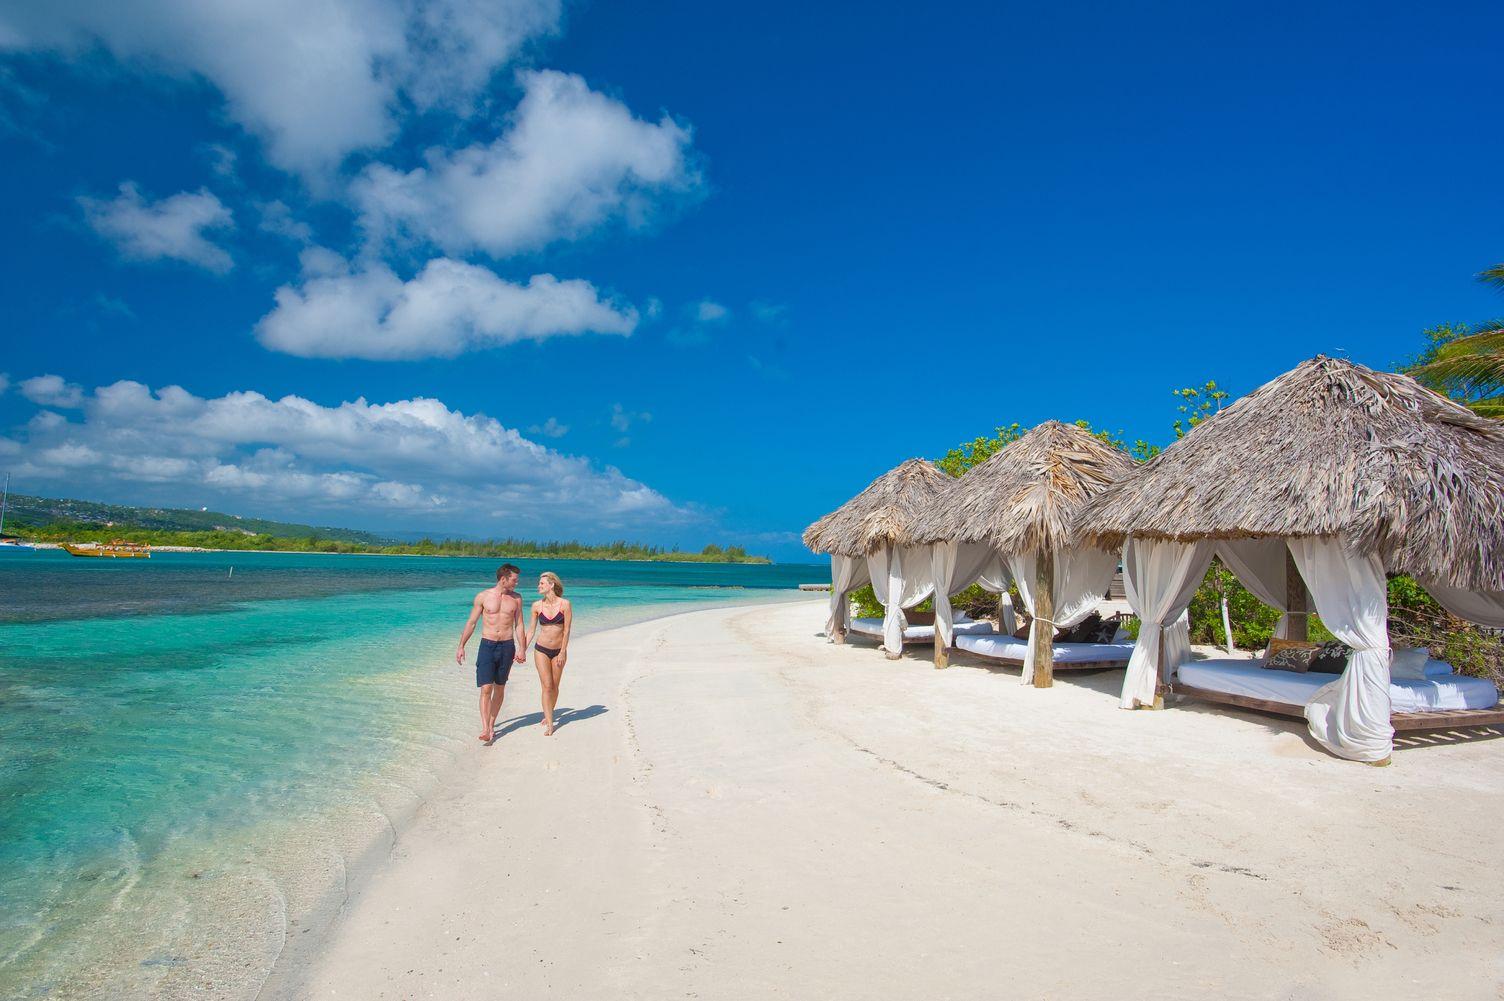 Paar spaziert am Strand entlang, Hand in Hand. Rechts stehen Strand Kabanas